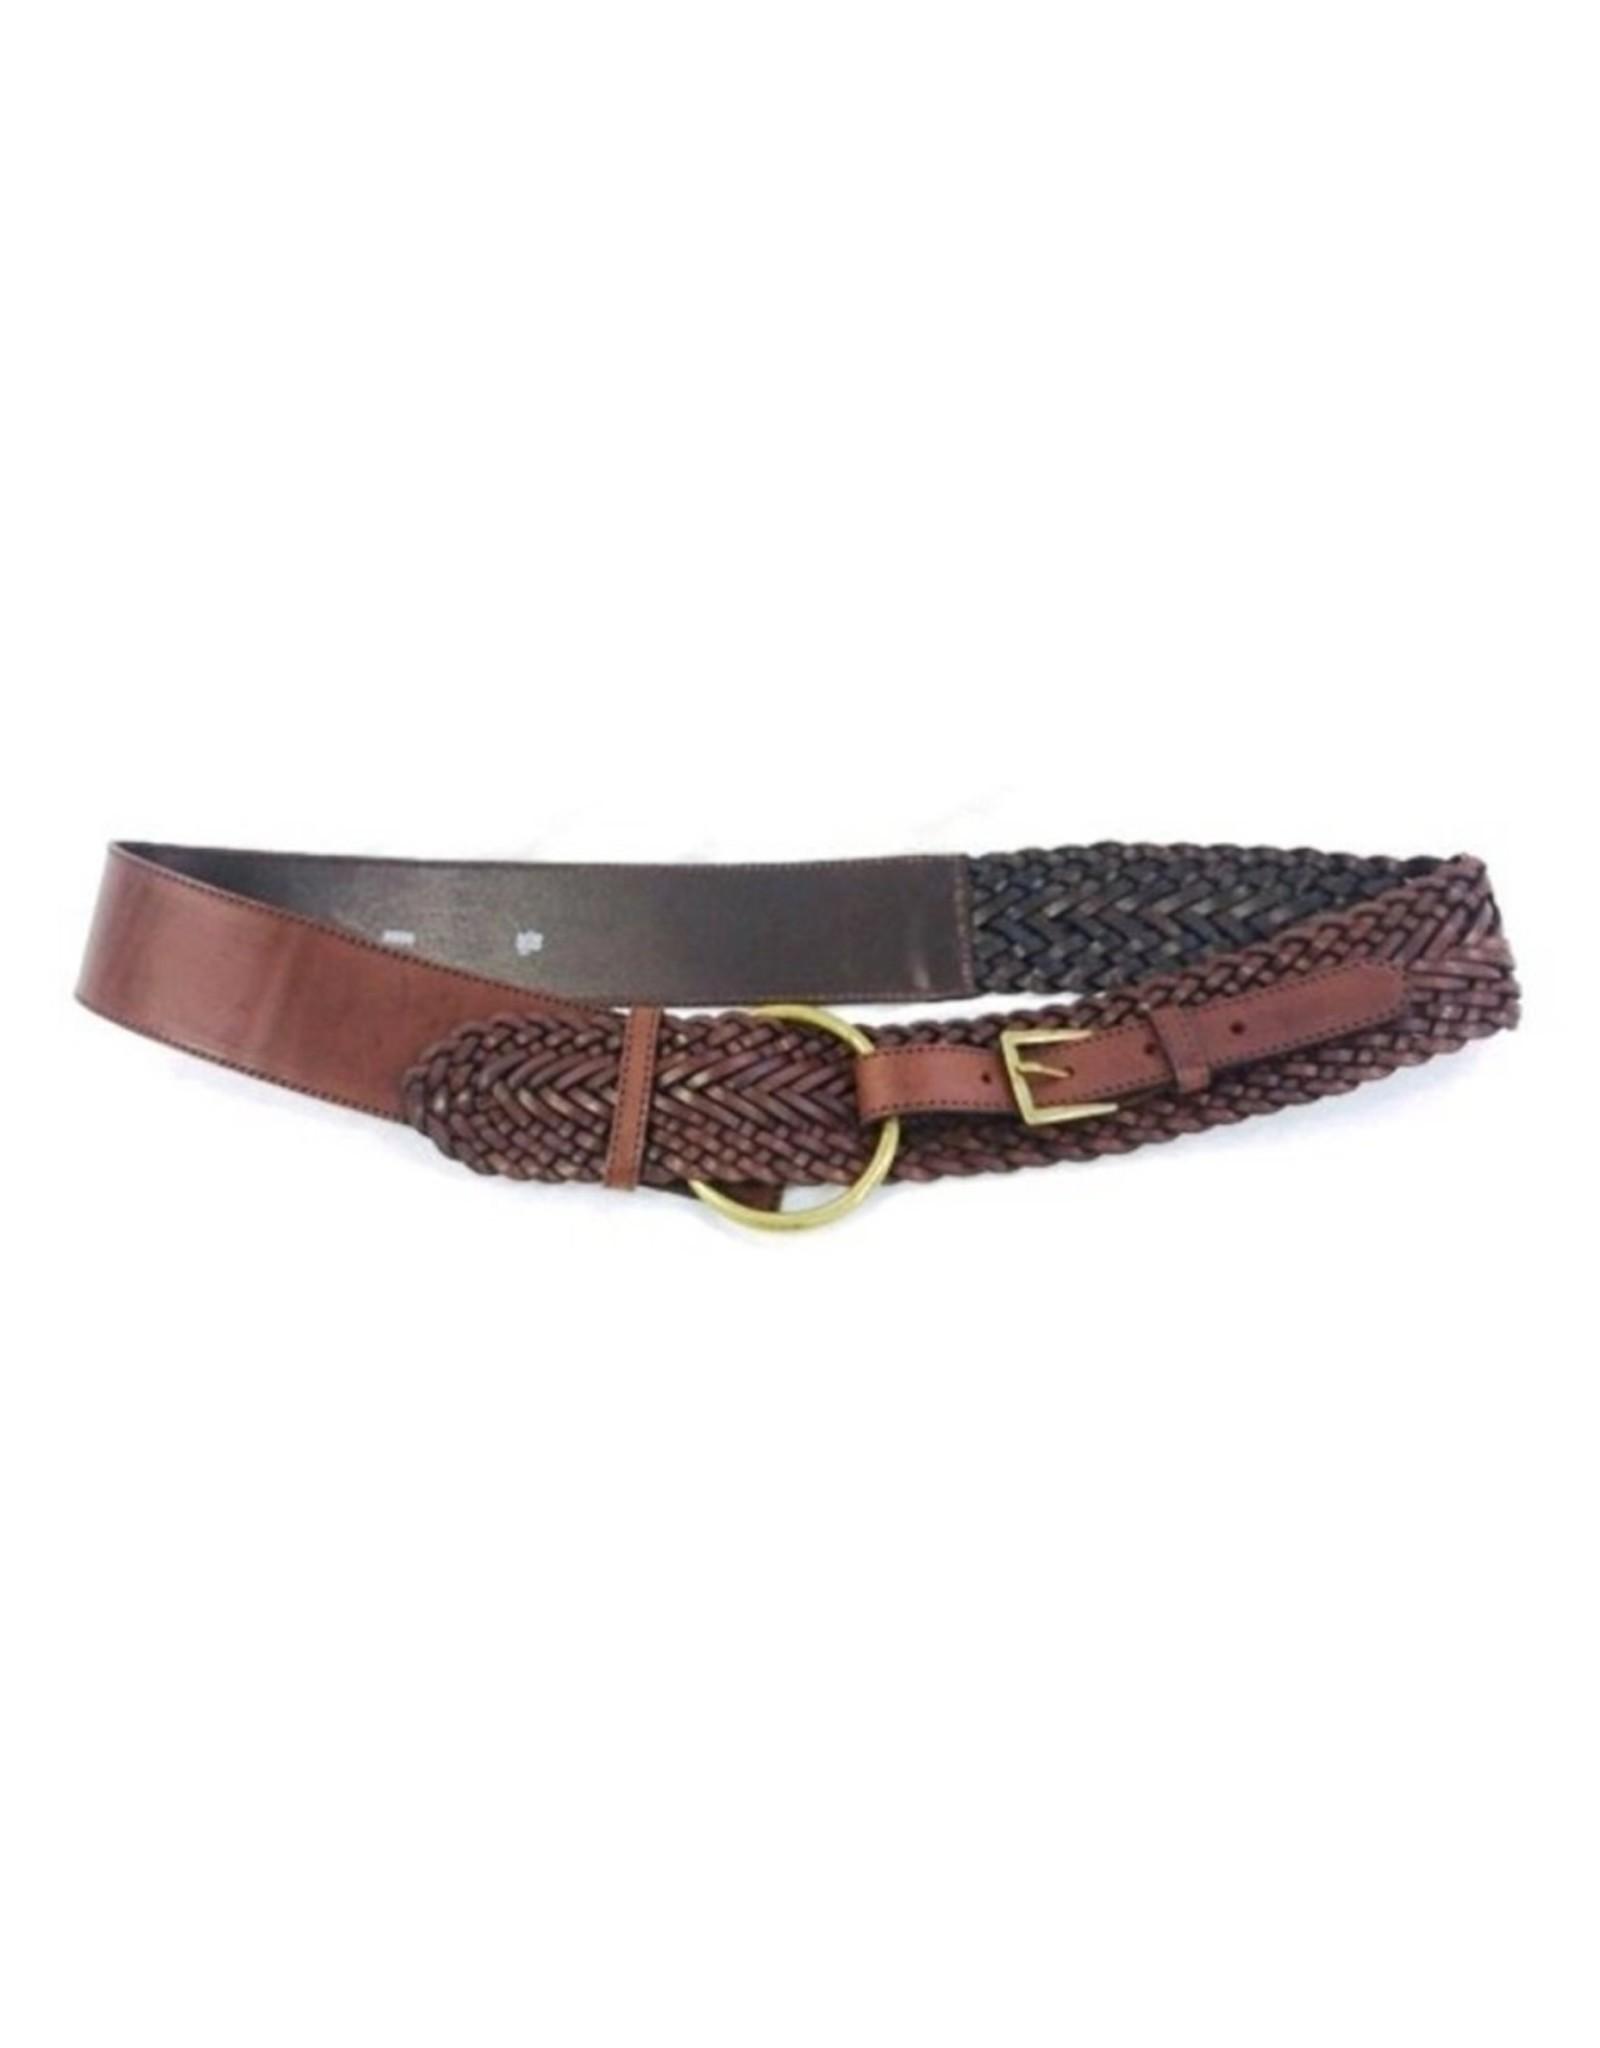 Hepco Leather belts - Hepco Leather Belt 8866b